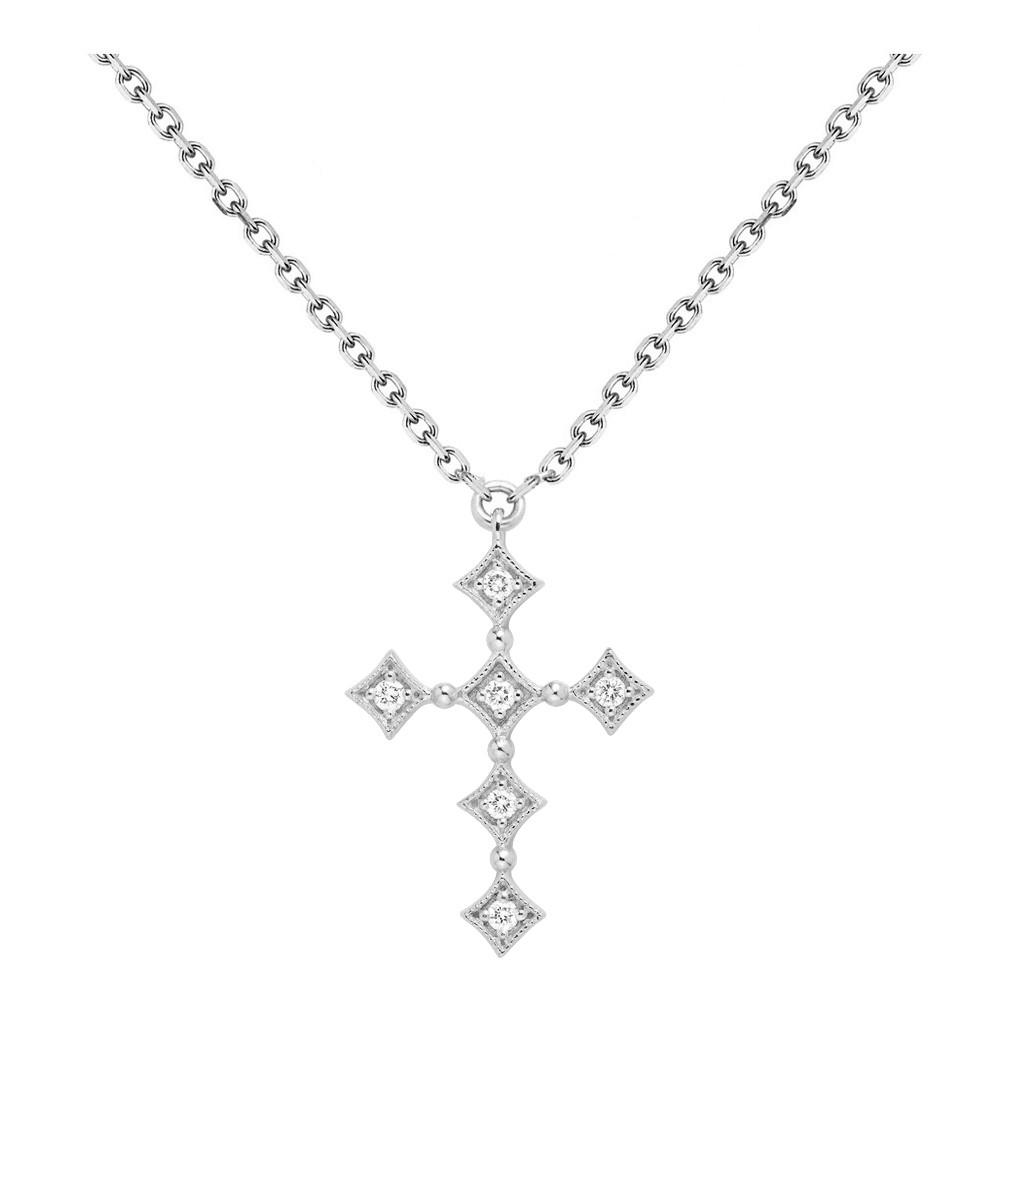 Collier Divine Or Diamants - STONE